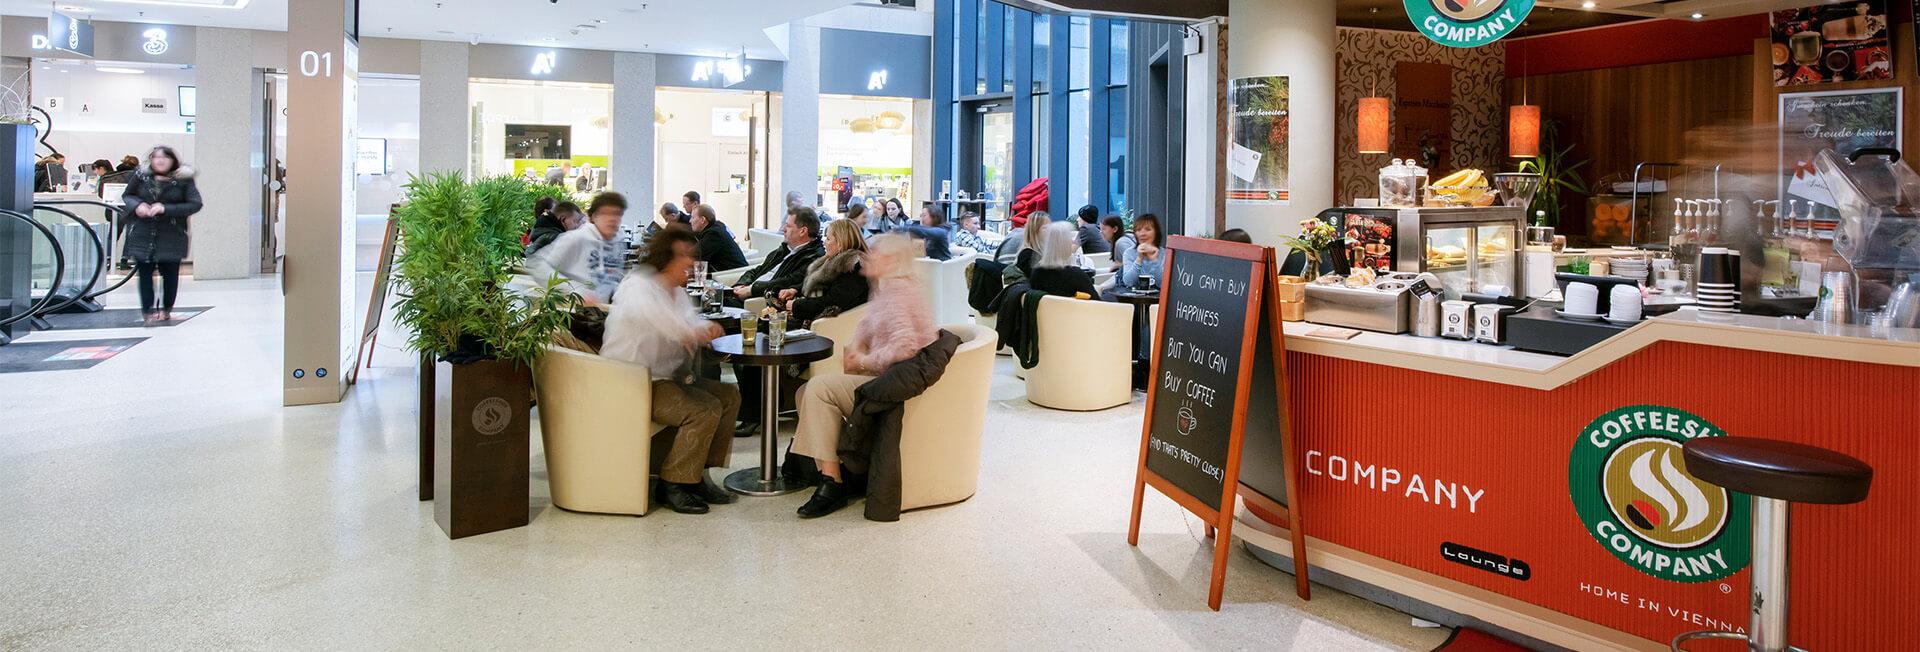 Coffeeshop-Company-Kaufhaus-Tyrol